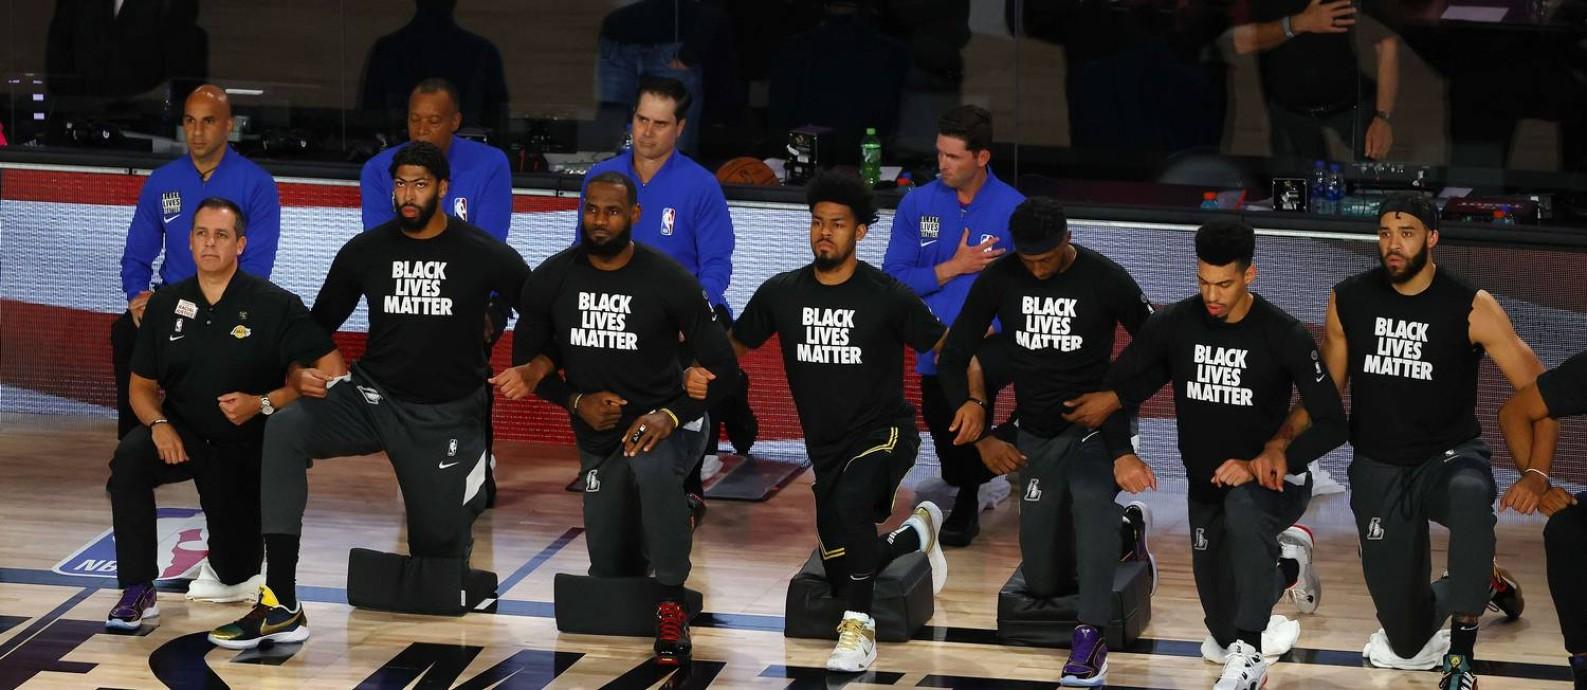 Jogadores do Los Angeles Lakers ajoelhados em protesto durante o hino americano Foto: Kevin C. Cox / AFP